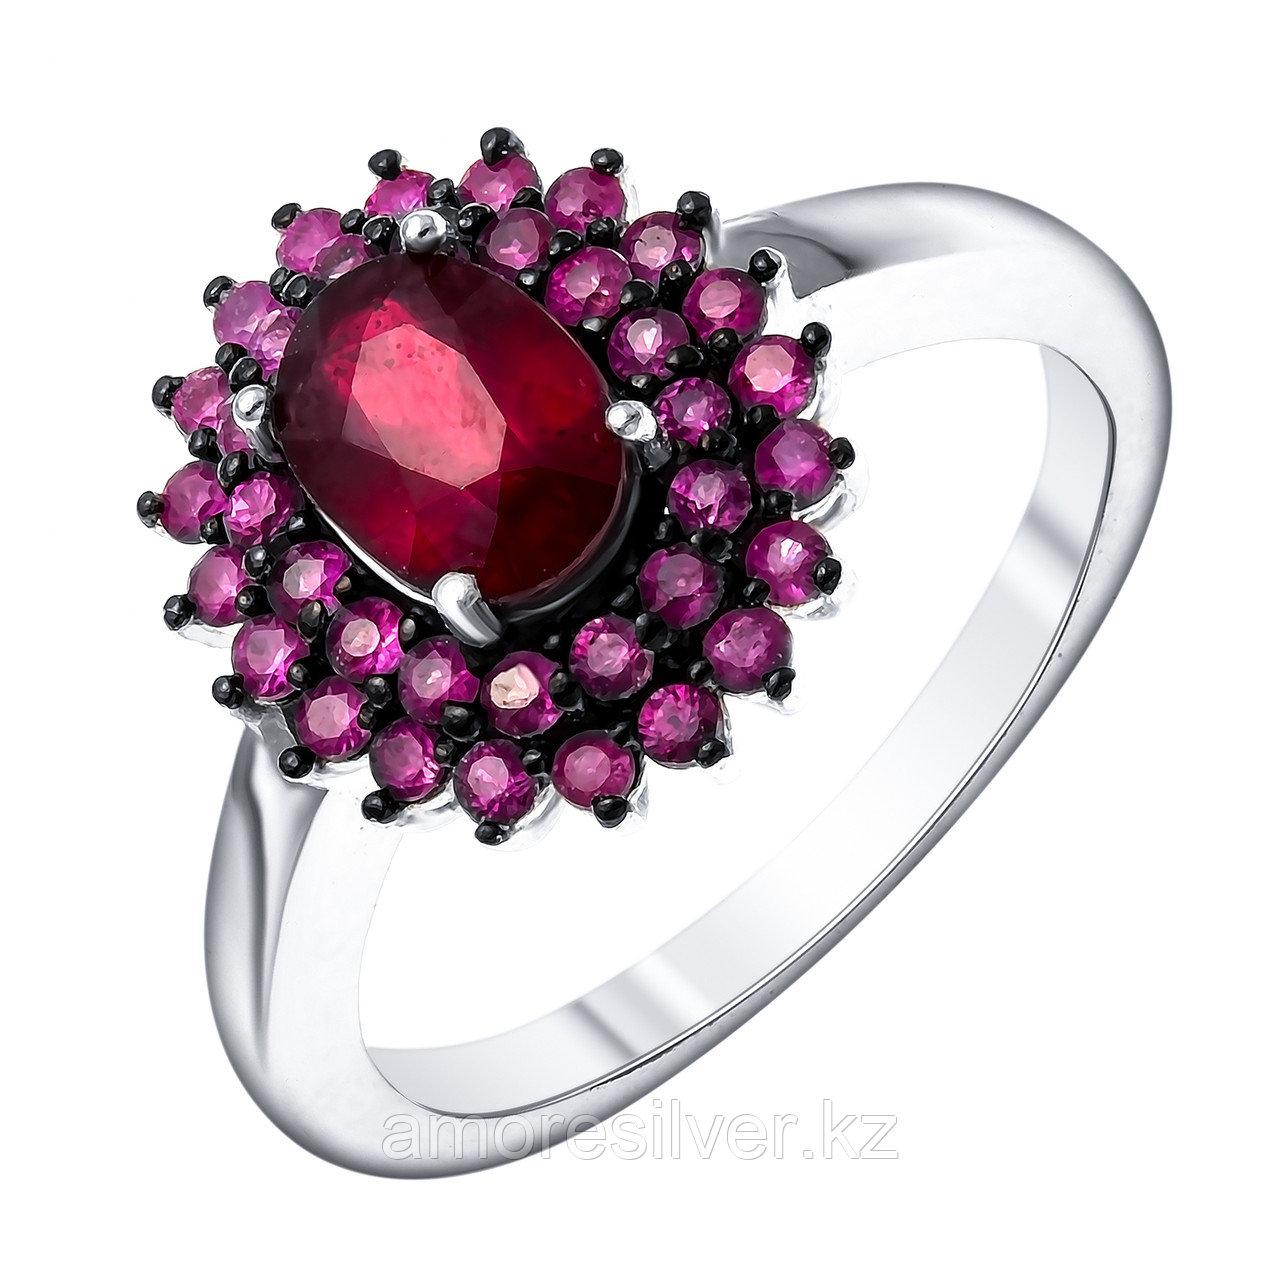 Серебряное кольцо с рубином  Teosa R-DRGR00911-RB размеры - 17 18 18,5